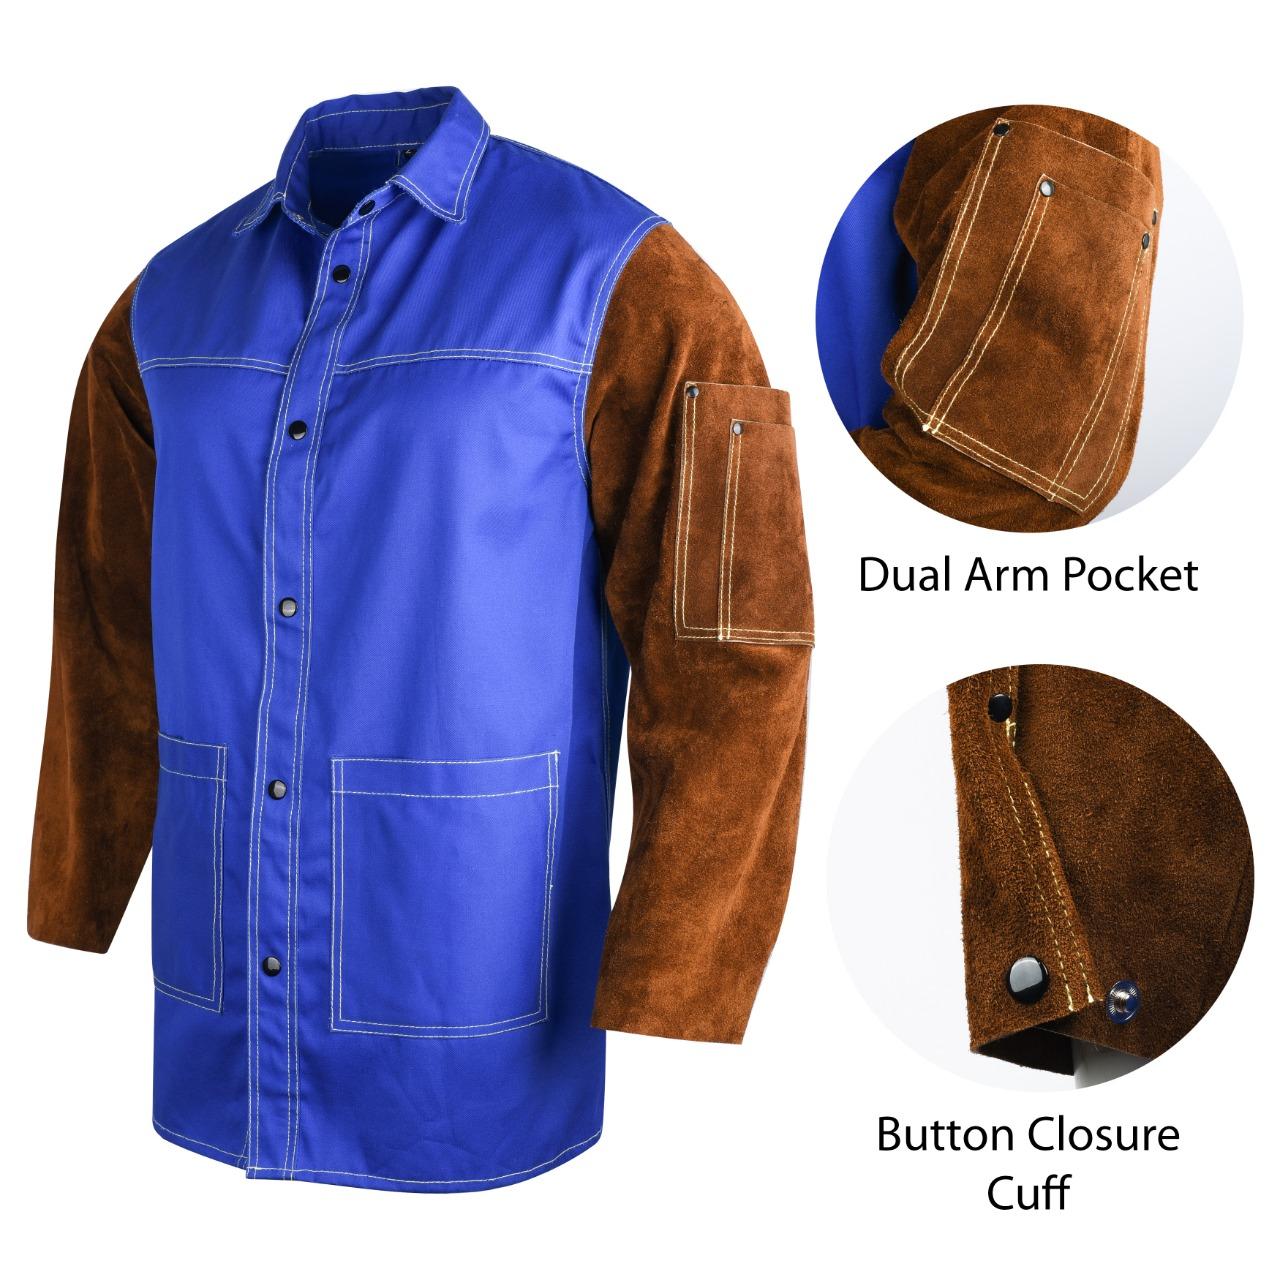 pocket for tool handling